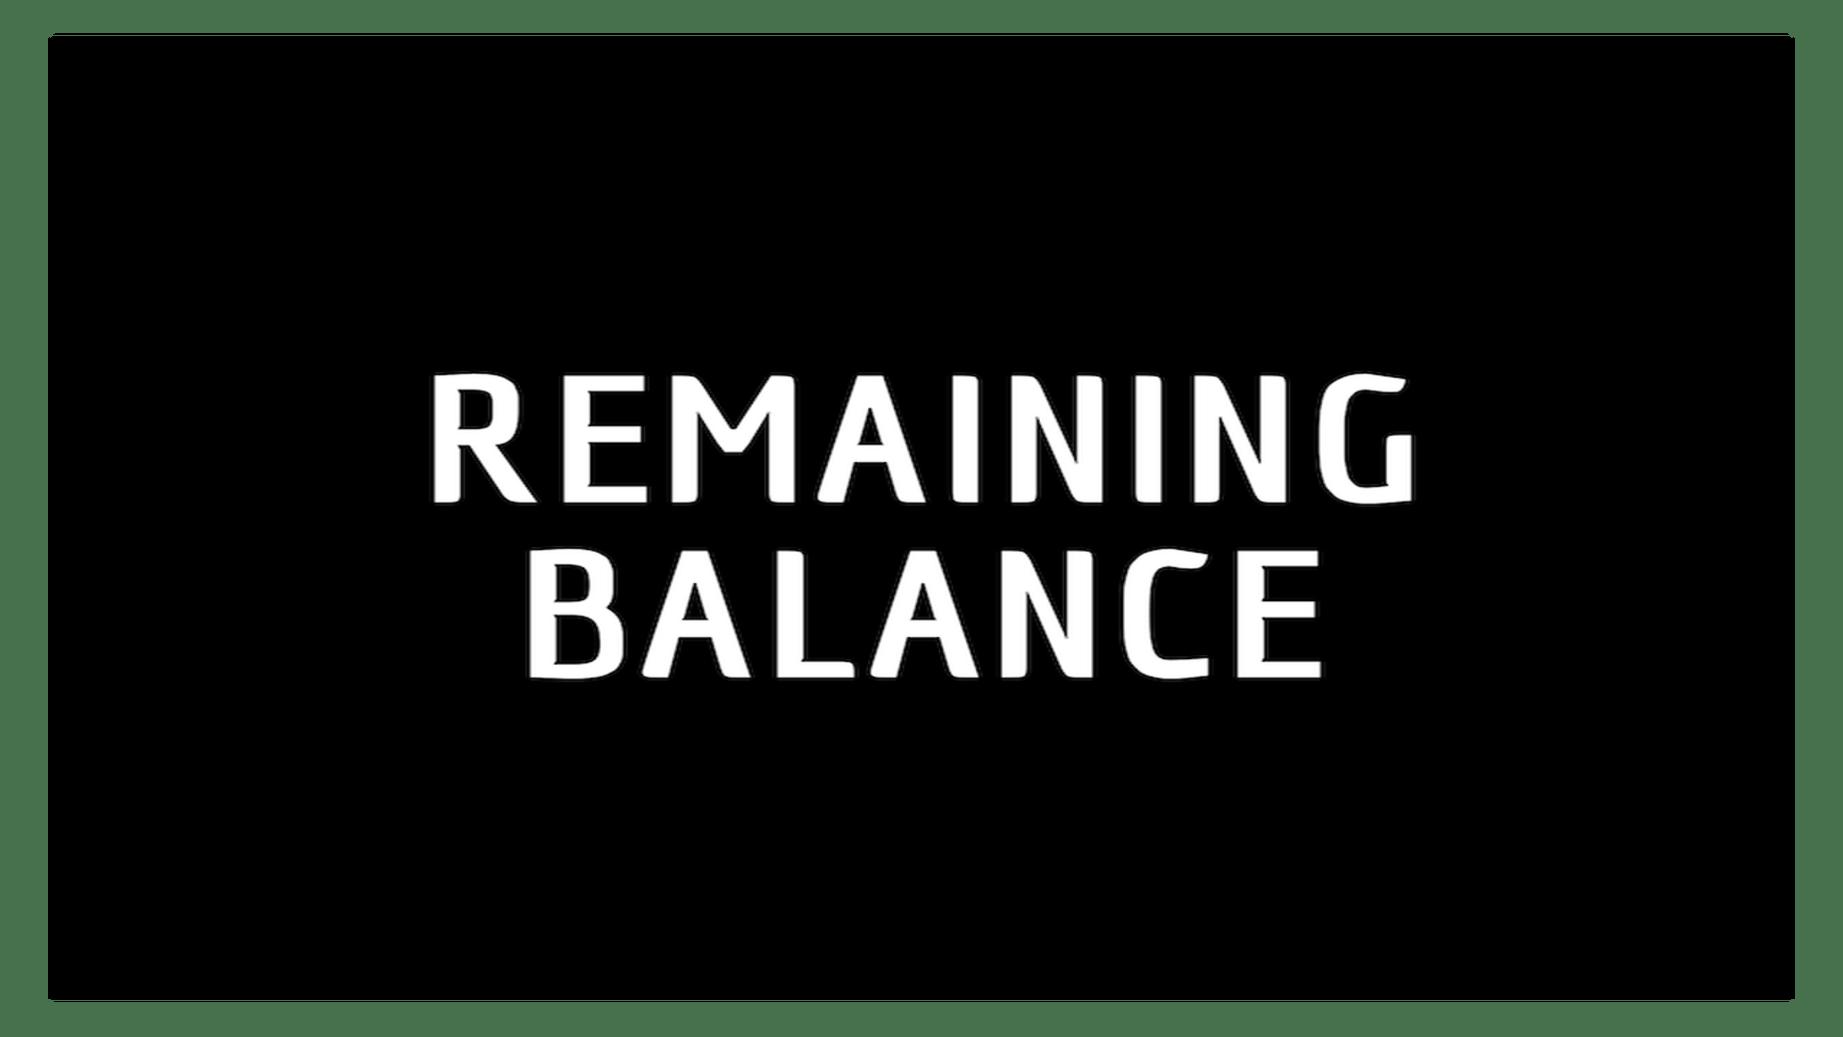 Remaining Balances